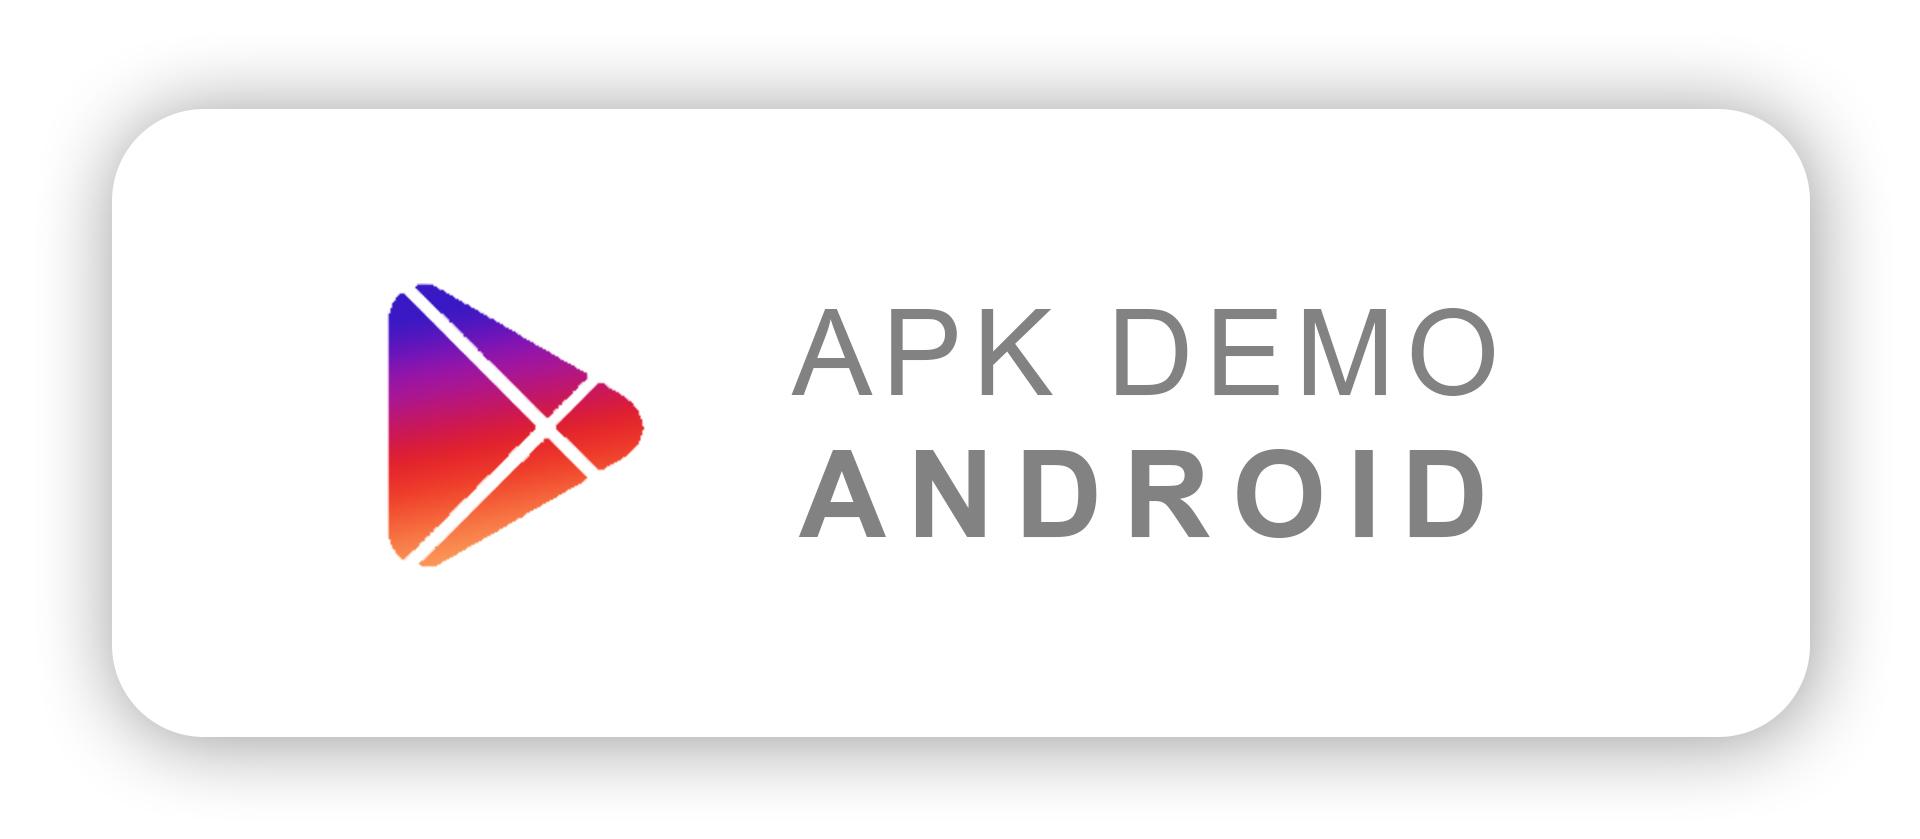 InstaFonts - Stylish Fonts & Stylish Text Generator Android App - 1